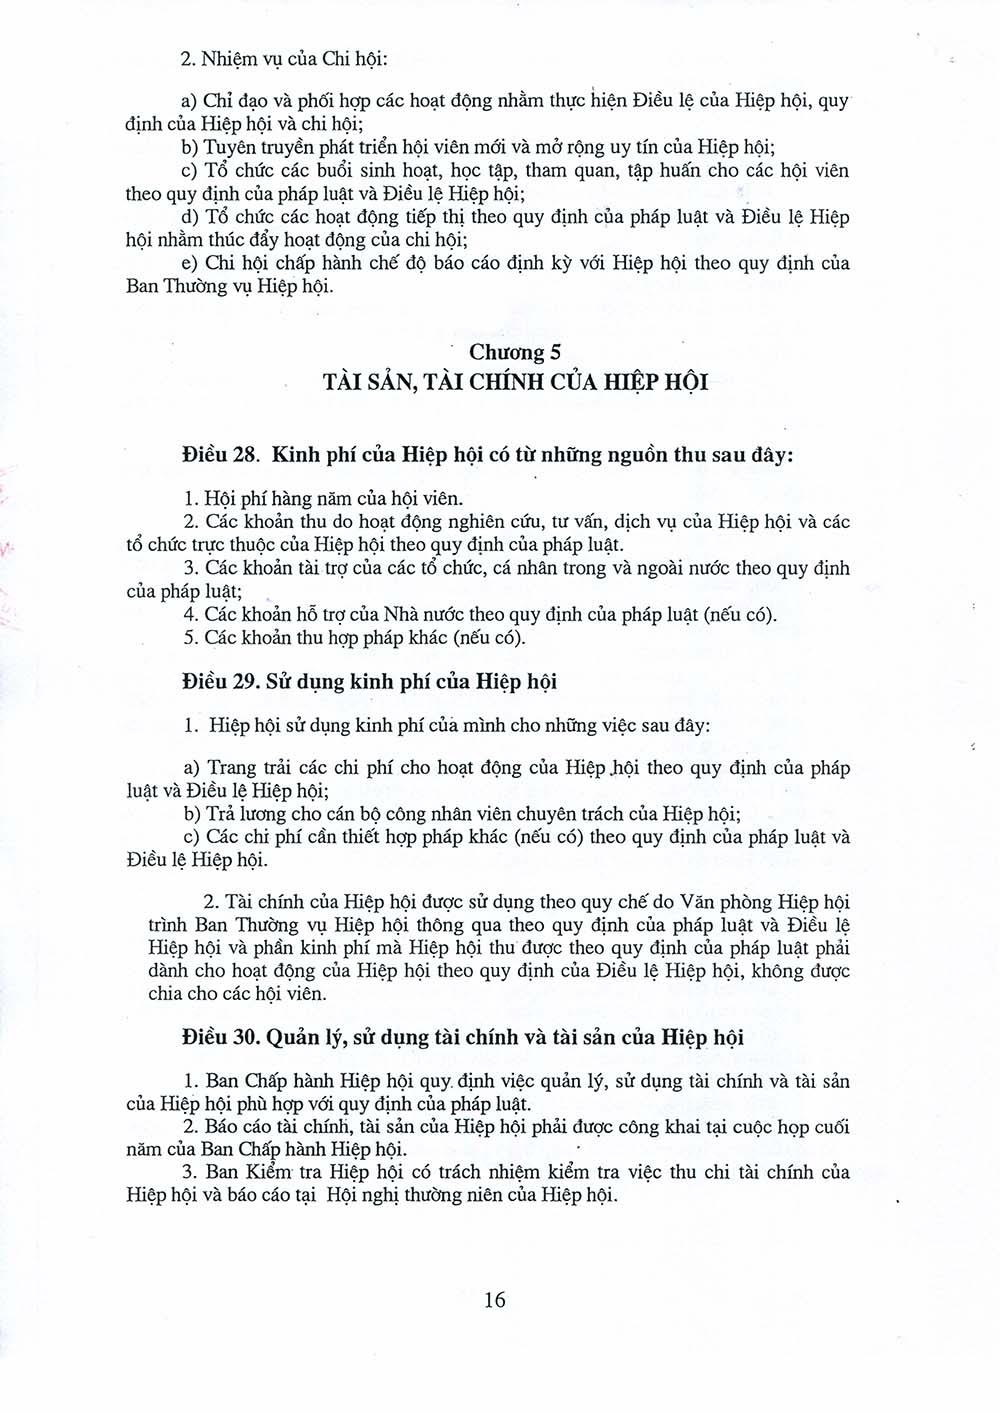 17 DIEU LE VKA - Trang 16